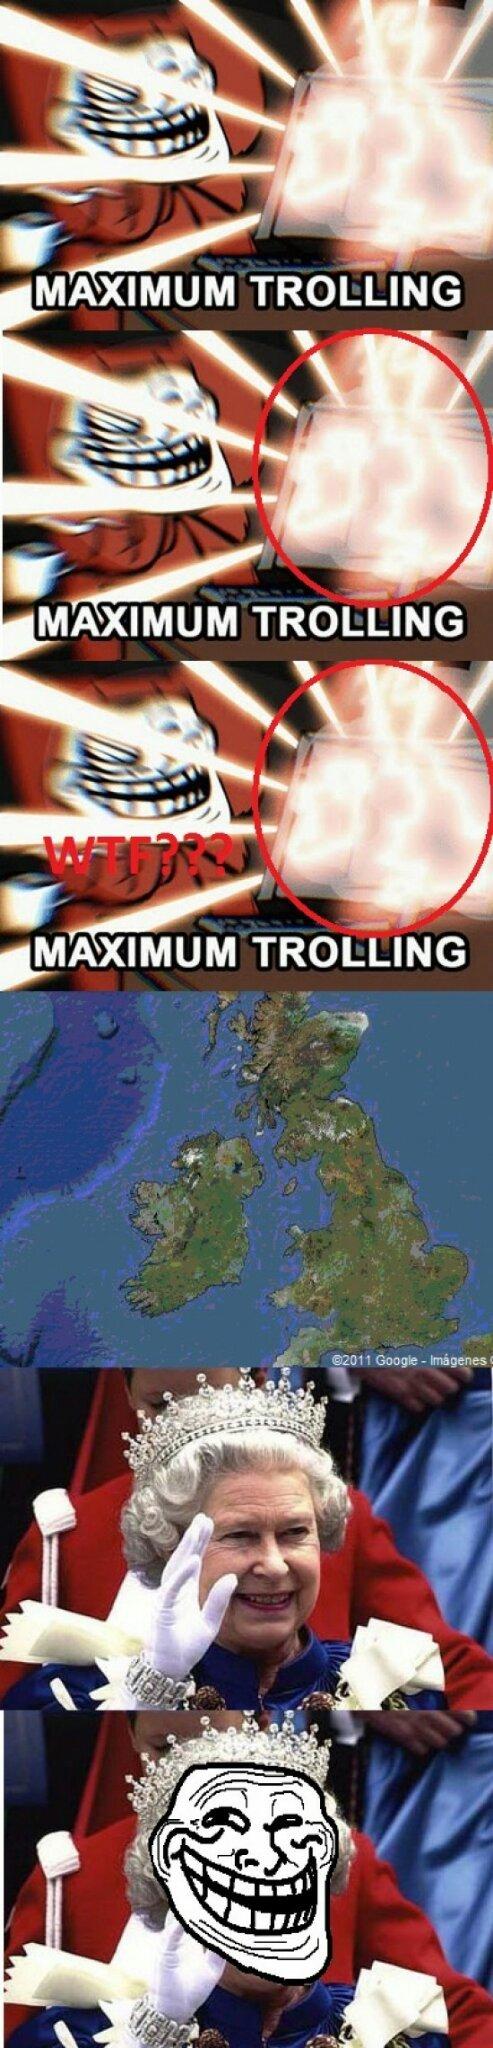 Esos ingleses son unos lokillos - meme